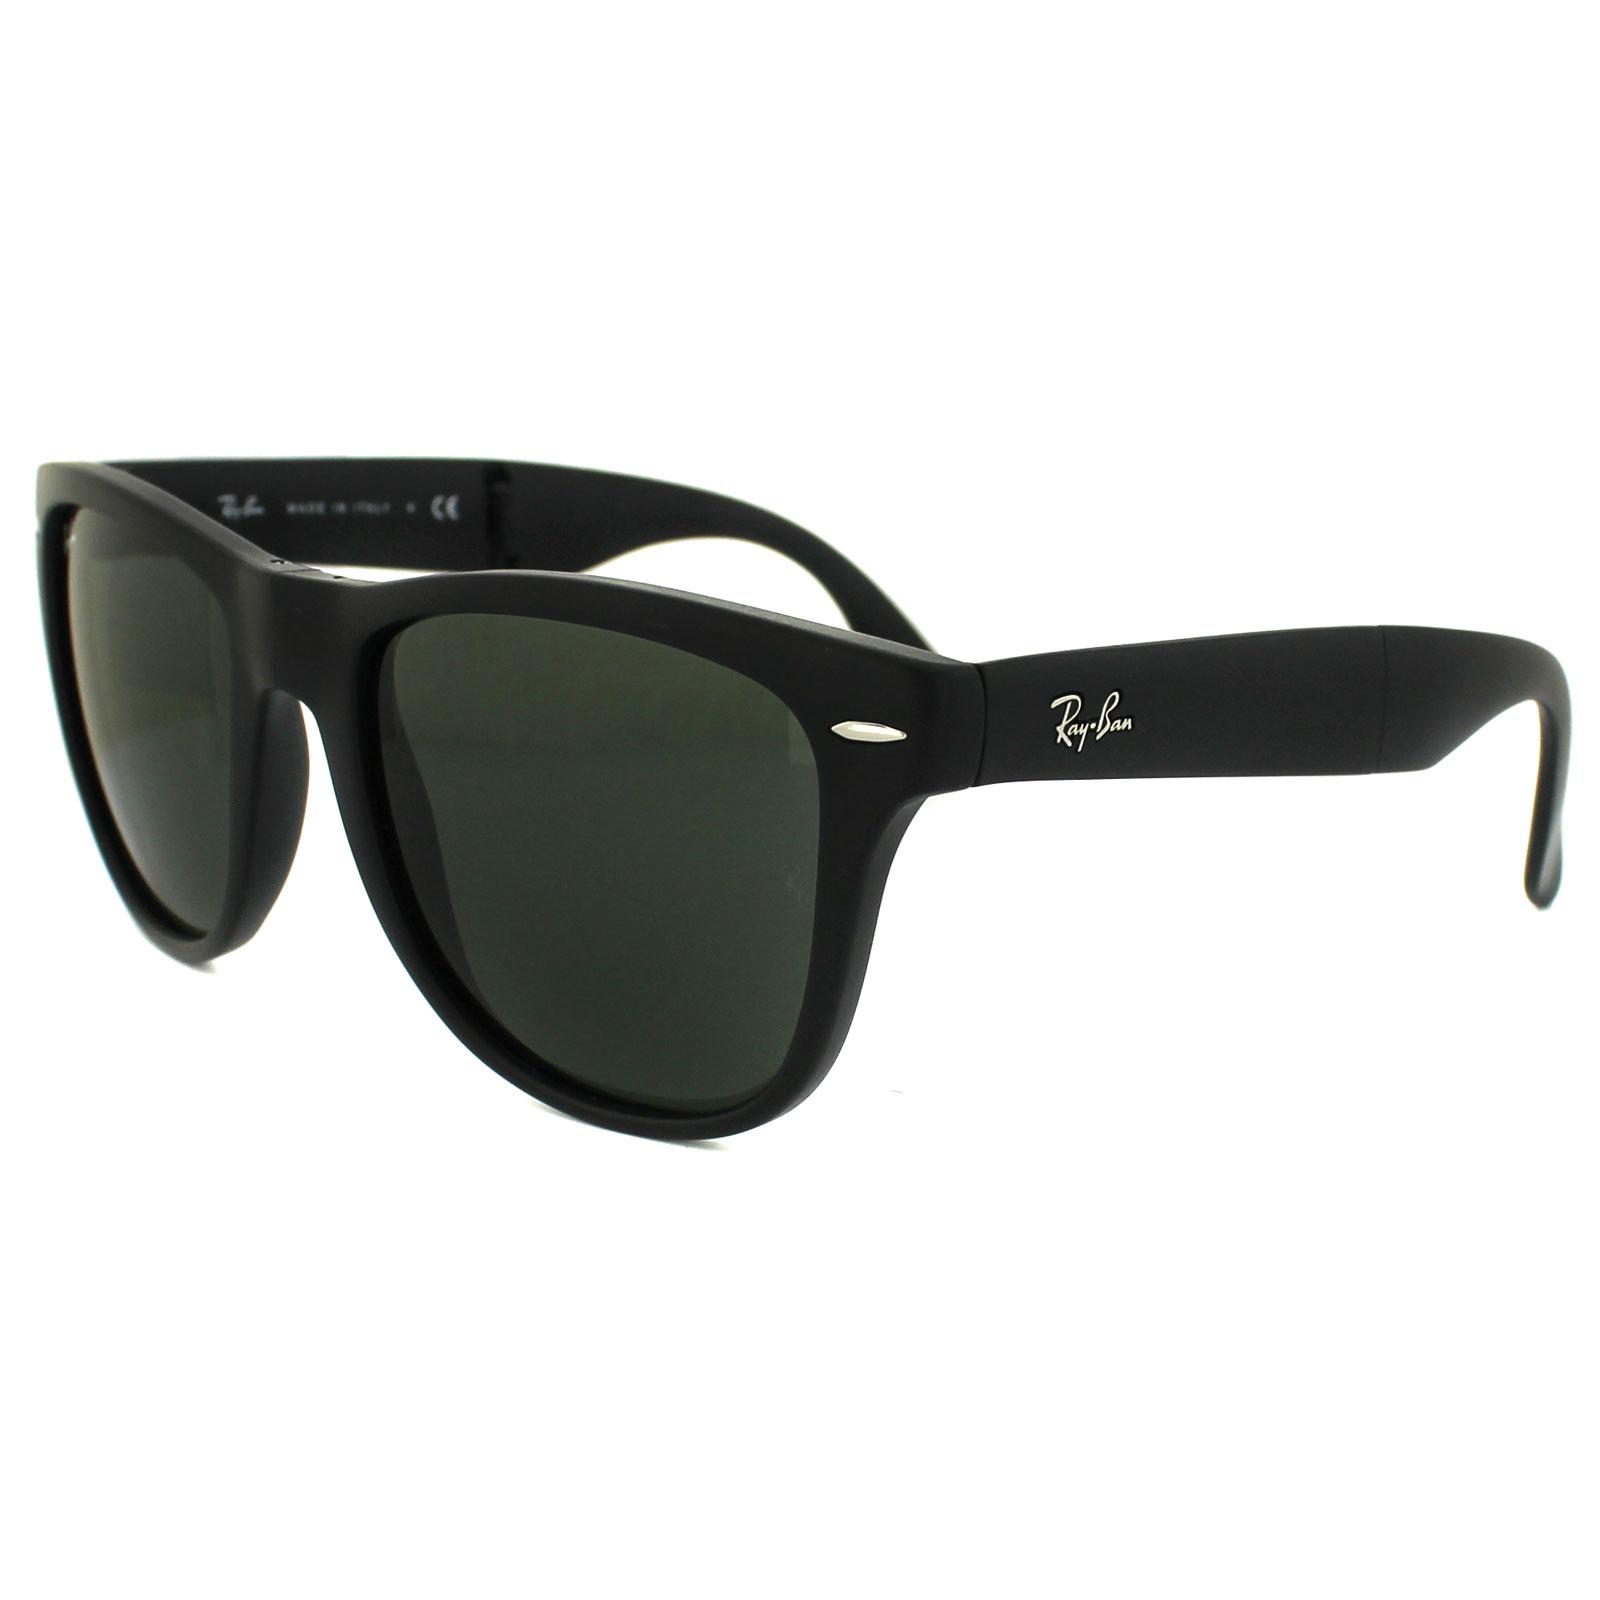 221634d29dfbf Sentinel Ray-Ban Sunglasses Folding Wayfarer 4105 Matt Black Green 601S  Large 54mm